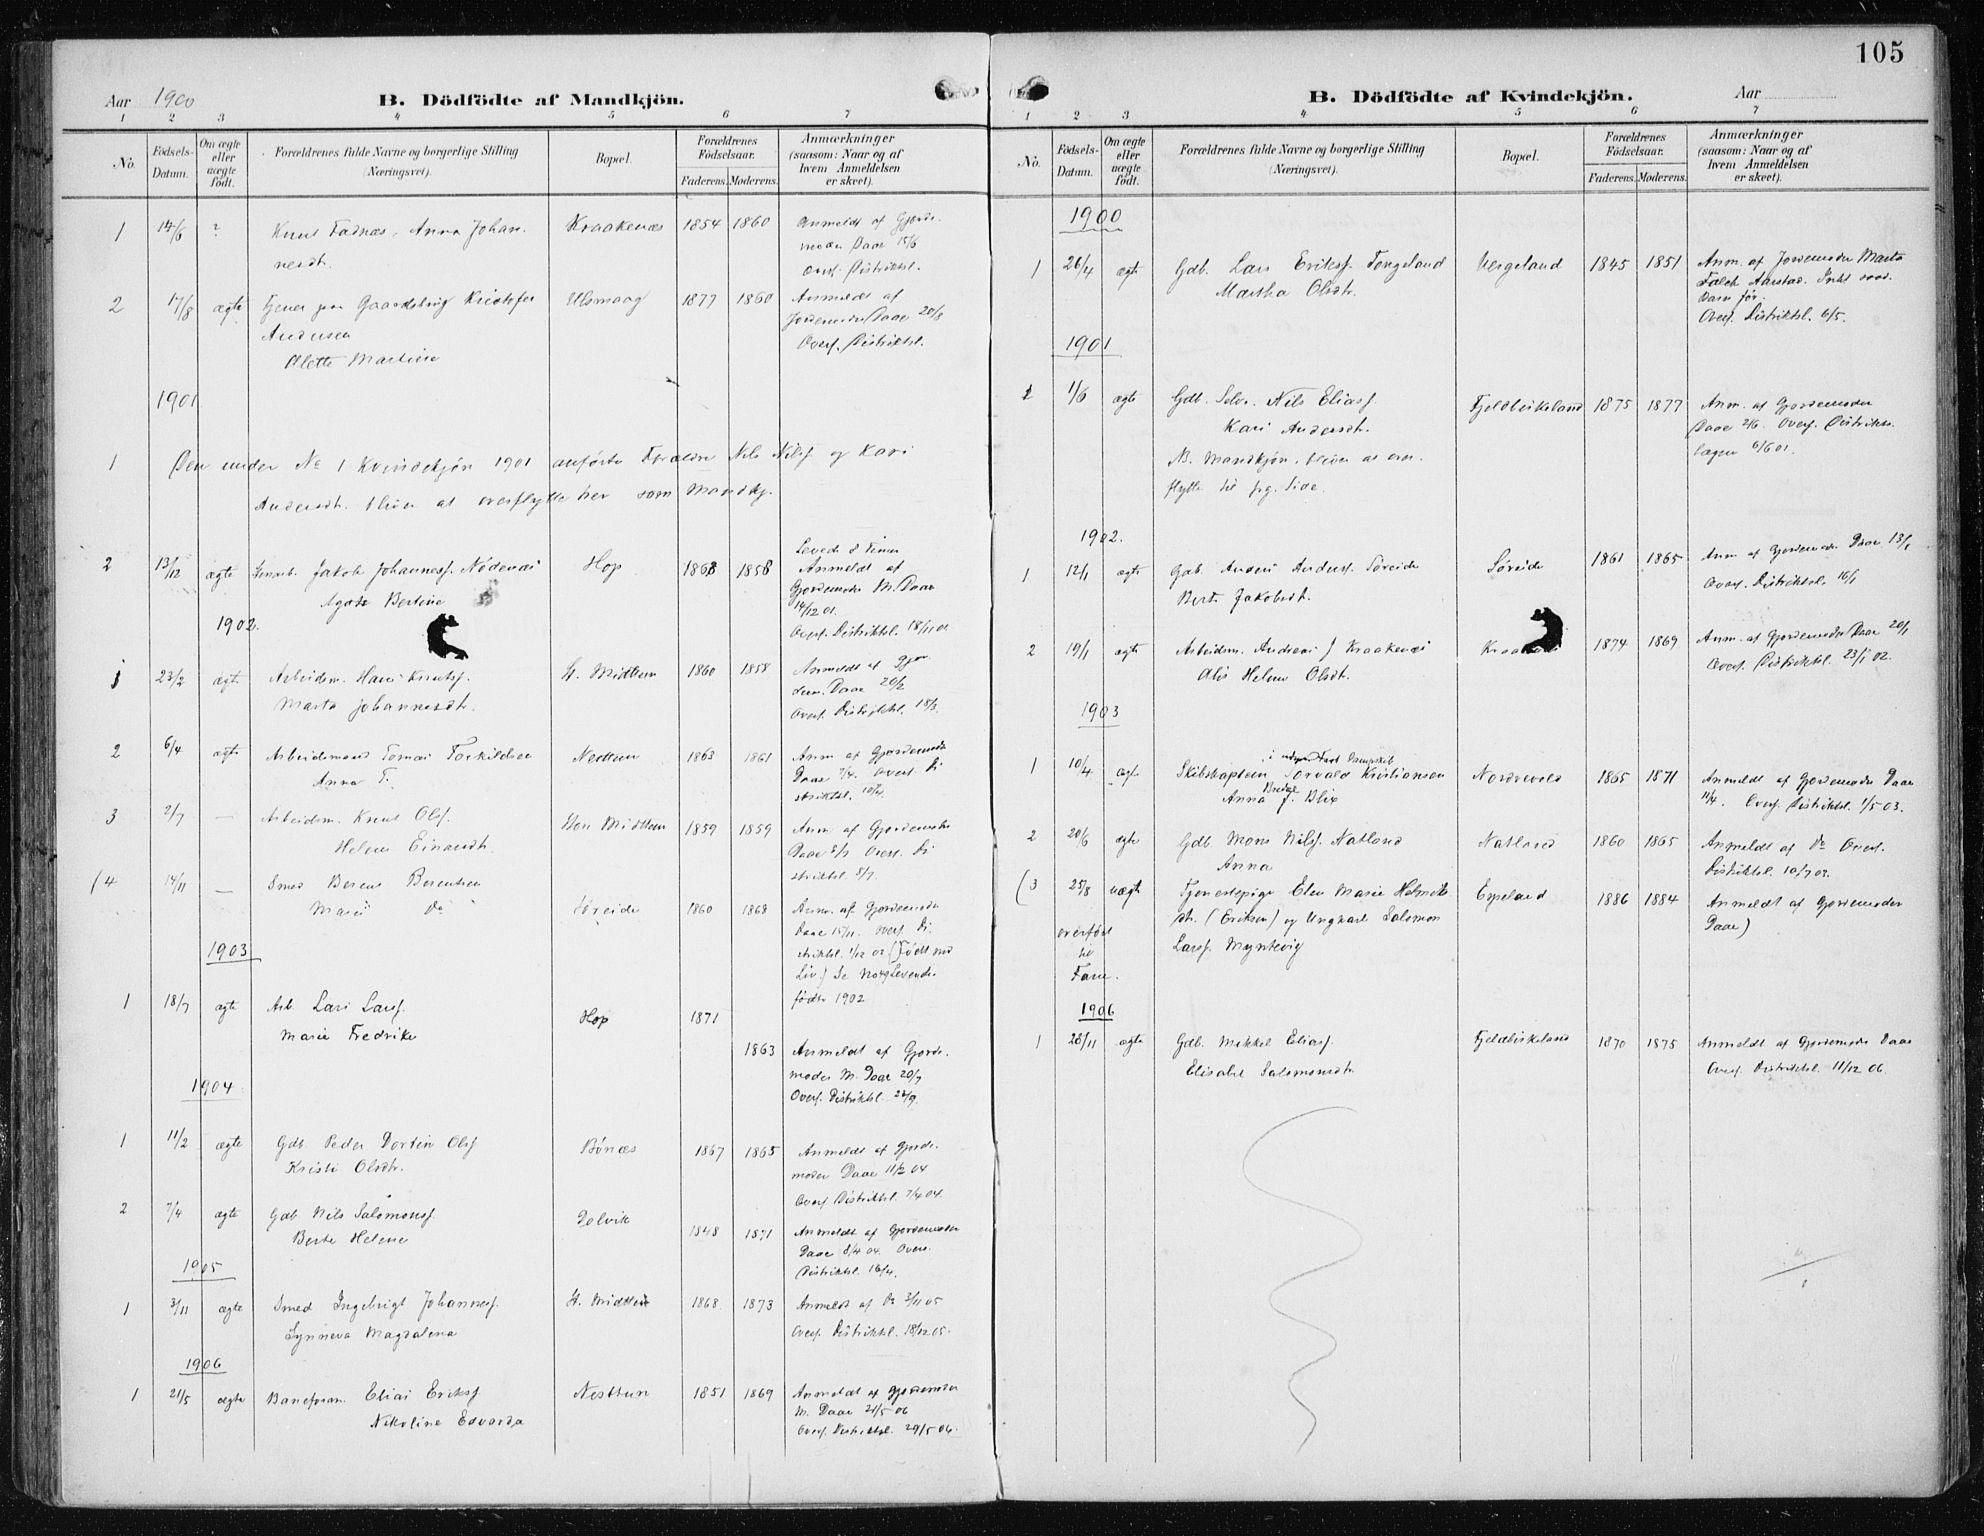 SAB, Fana Sokneprestembete, H/Haa/Haai/L0003: Ministerialbok nr. I 3, 1900-1912, s. 105